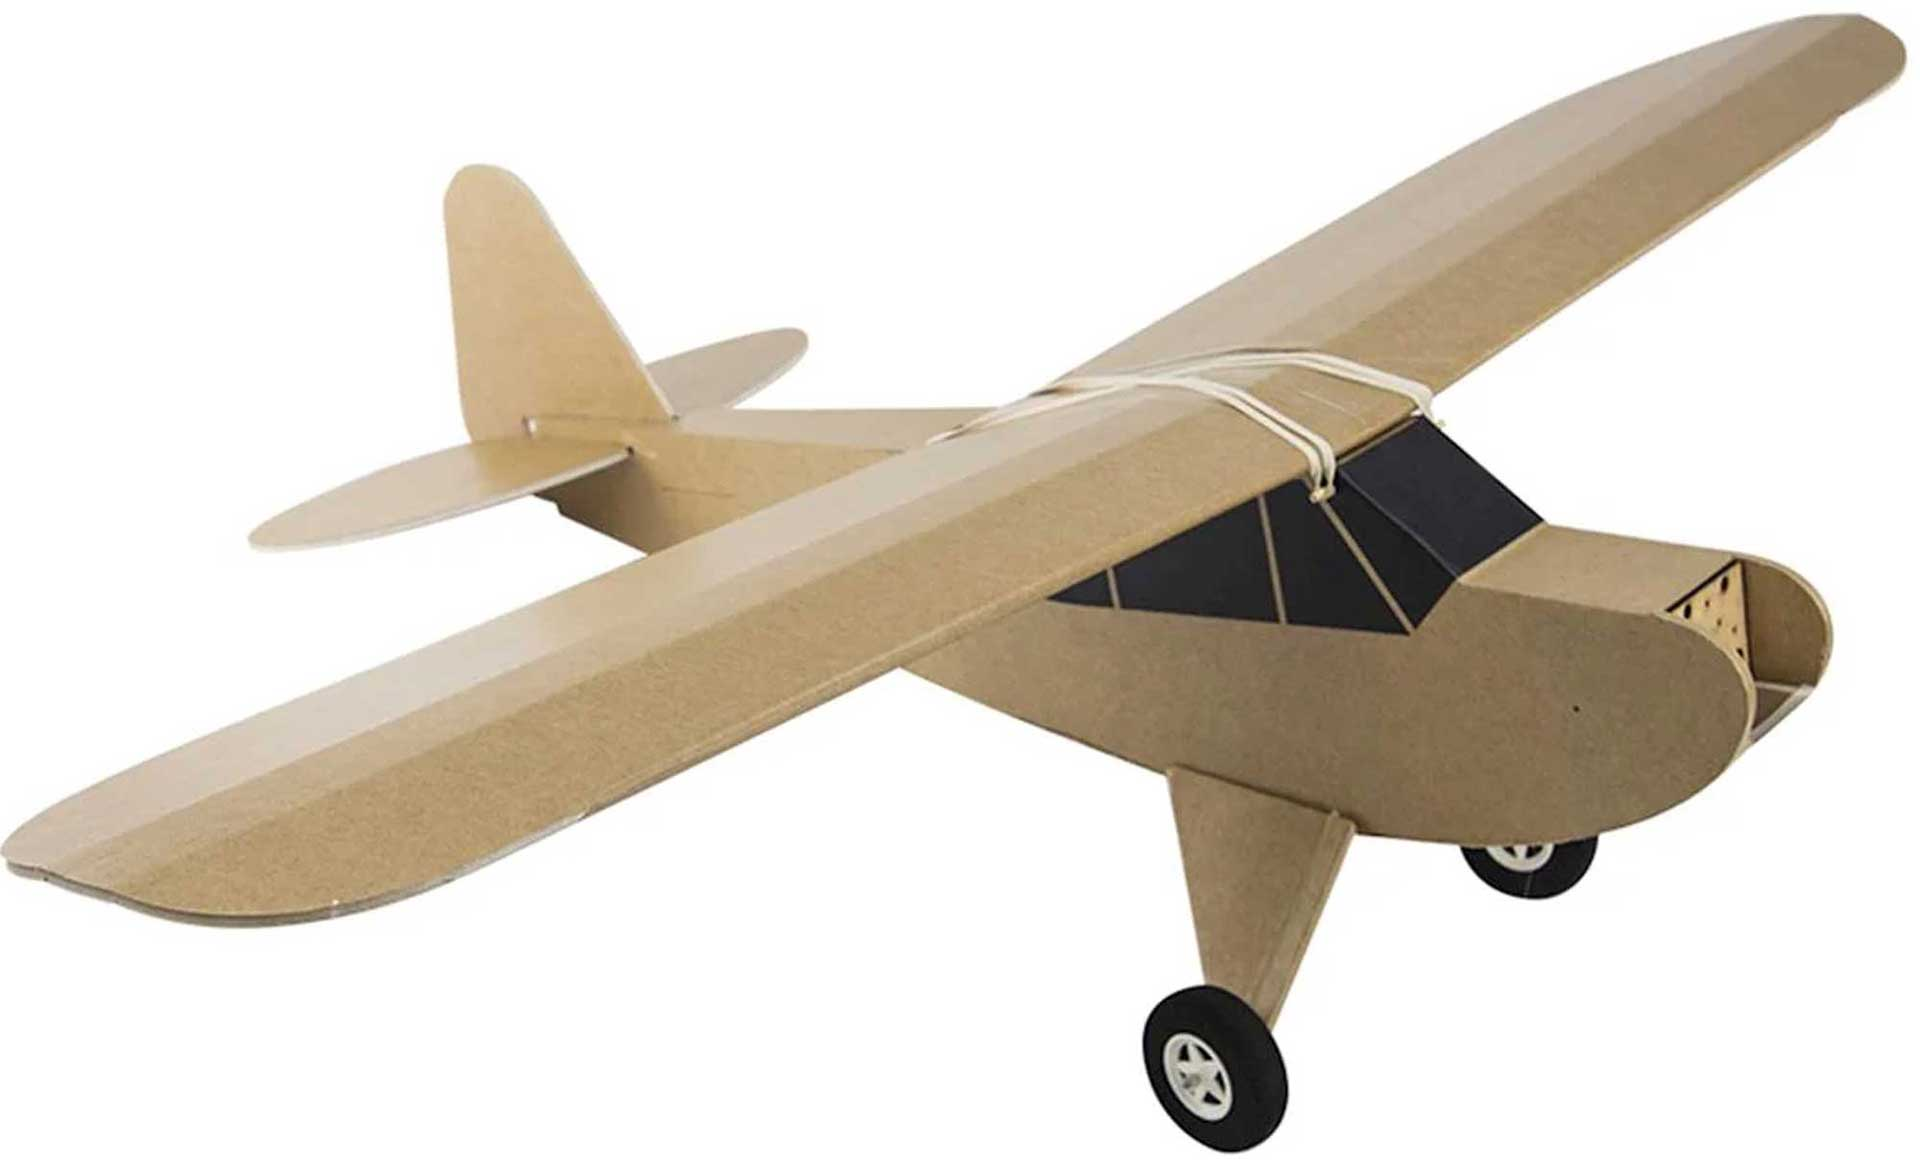 FLITE TEST Simple Cub Electric Airplane Kit (956mm)